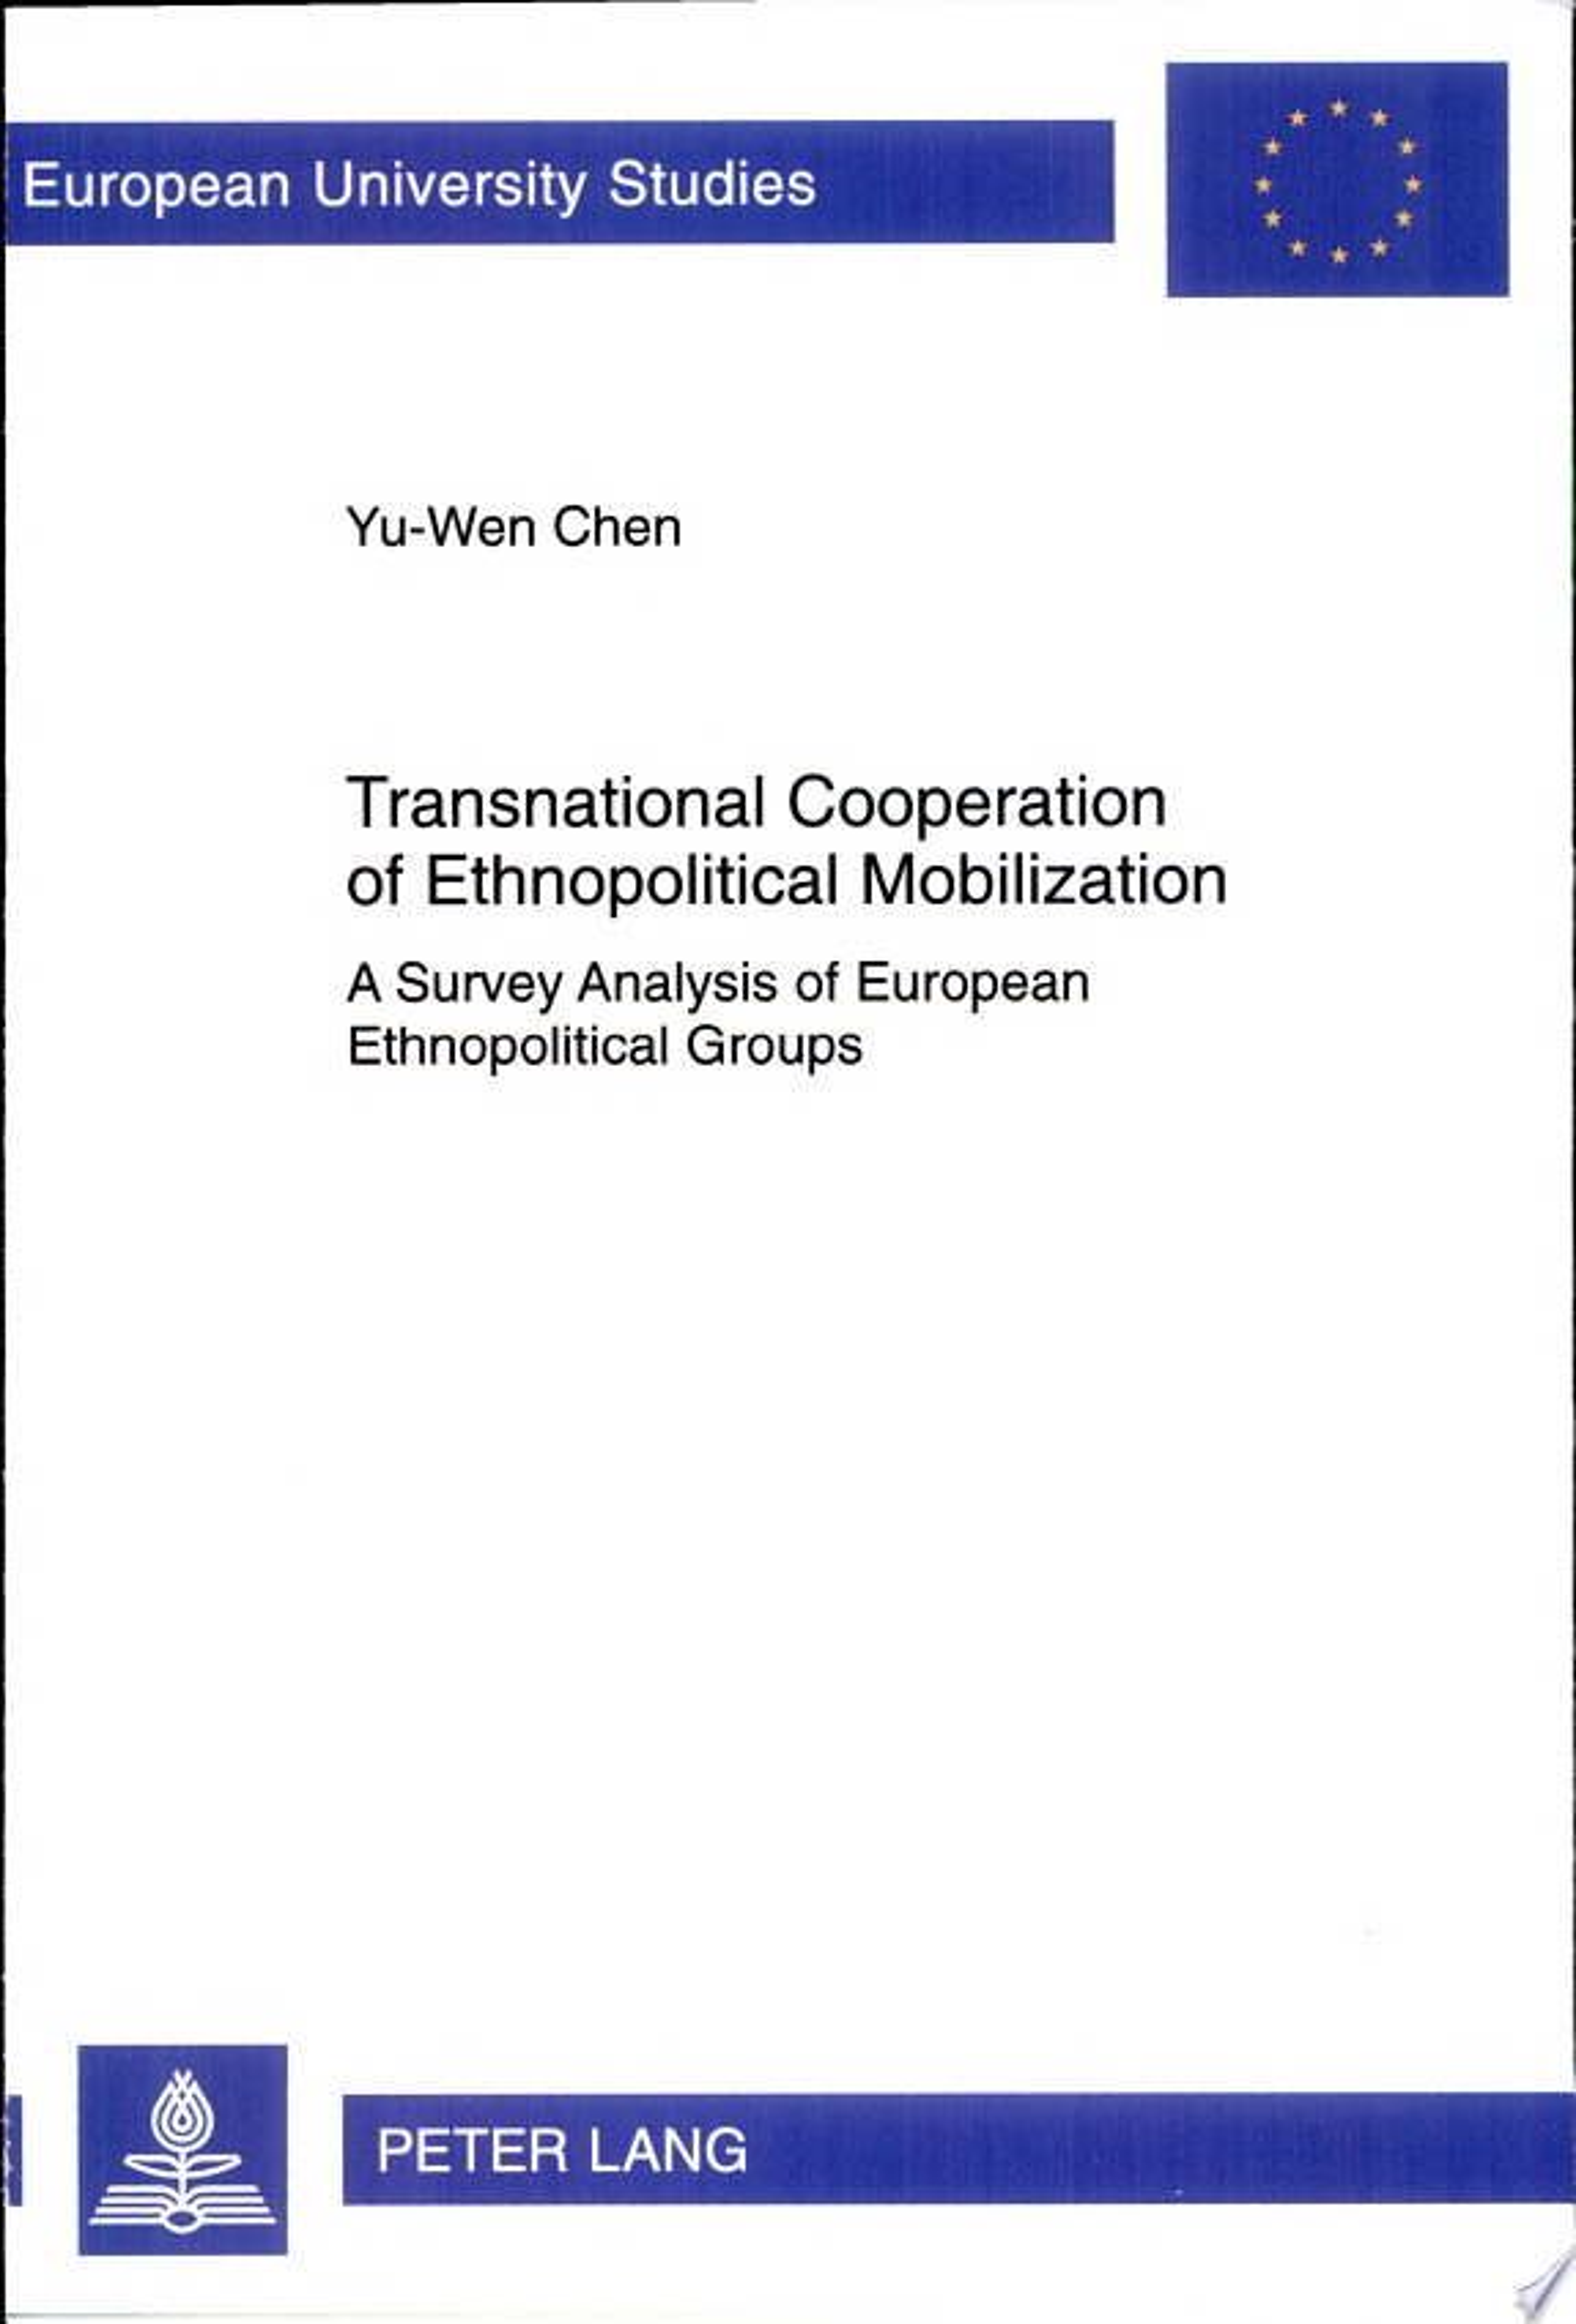 Transnational Cooperation of Ethnopolitical Mobilization